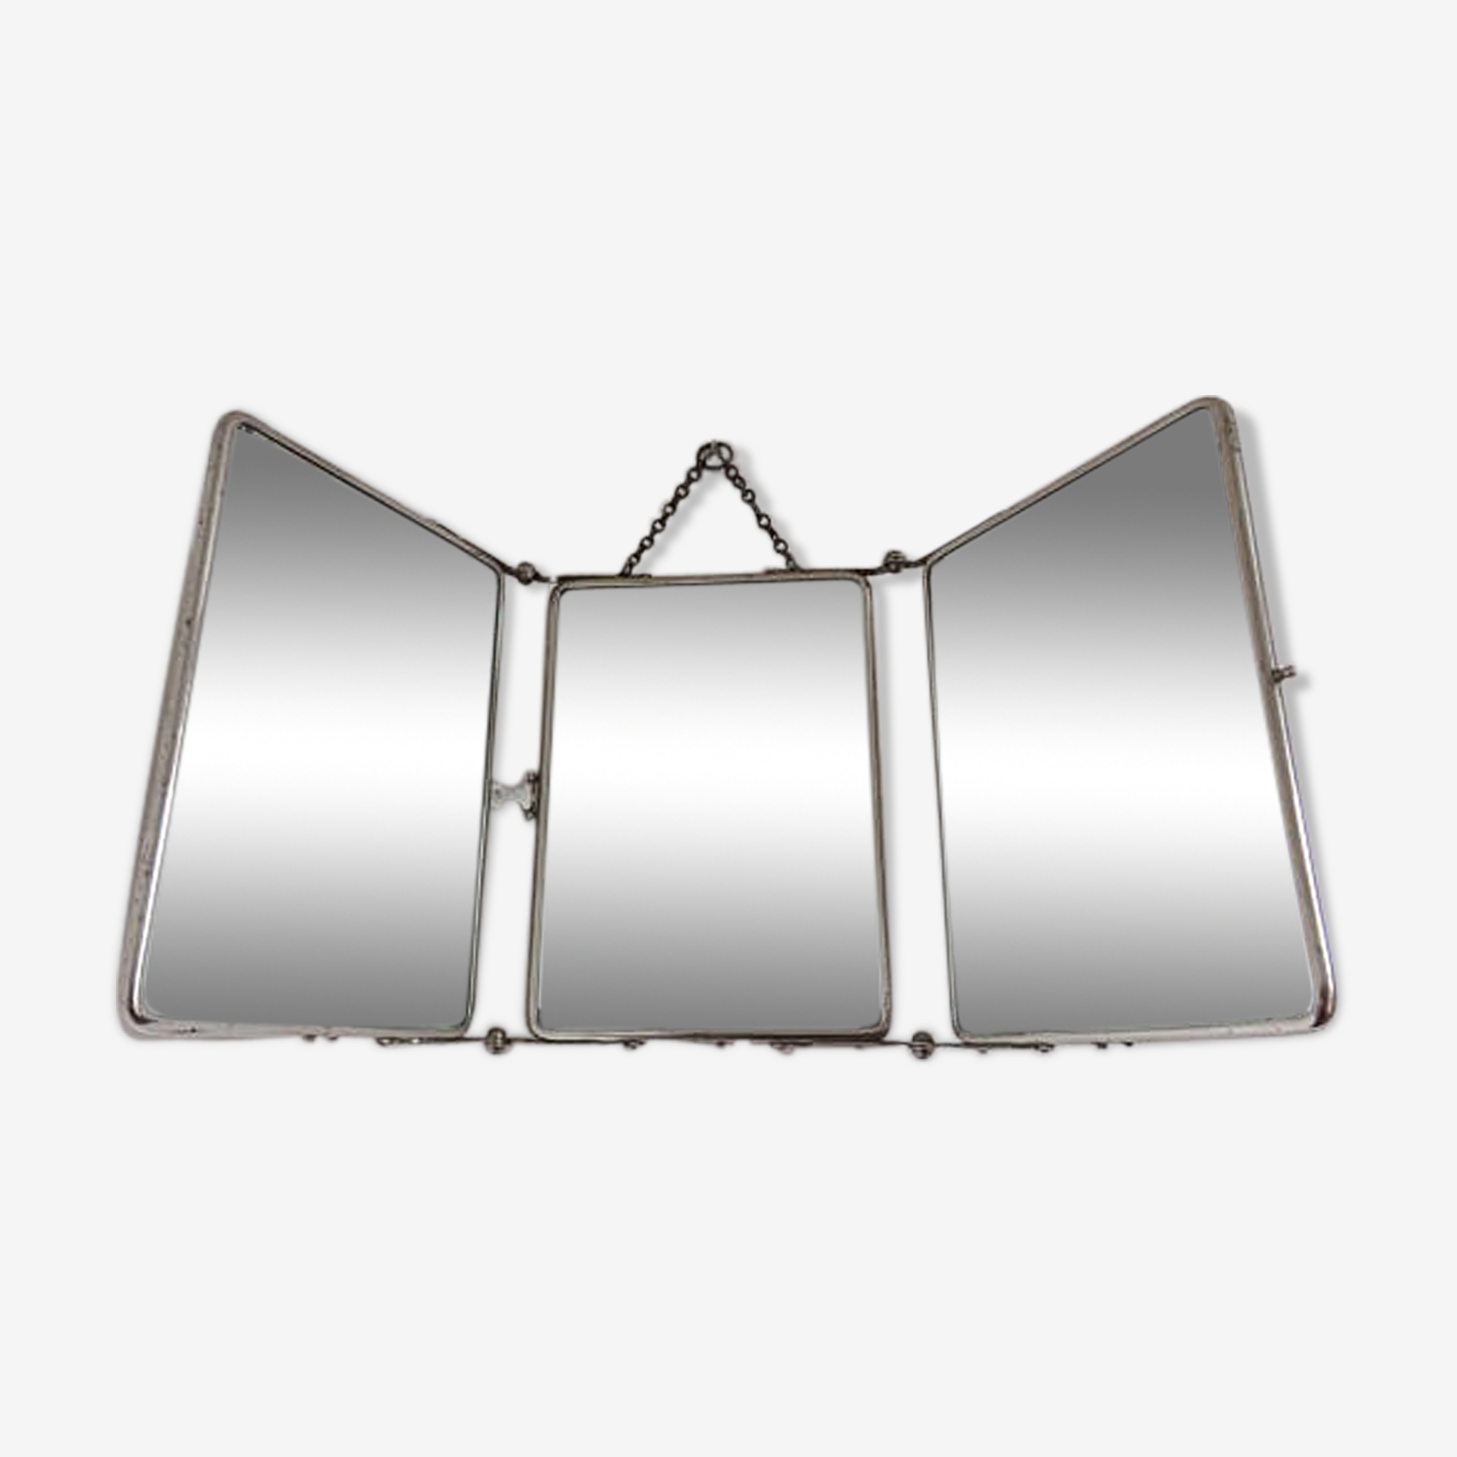 Barber beveled triptych mirror 40s 50s 21x50cm